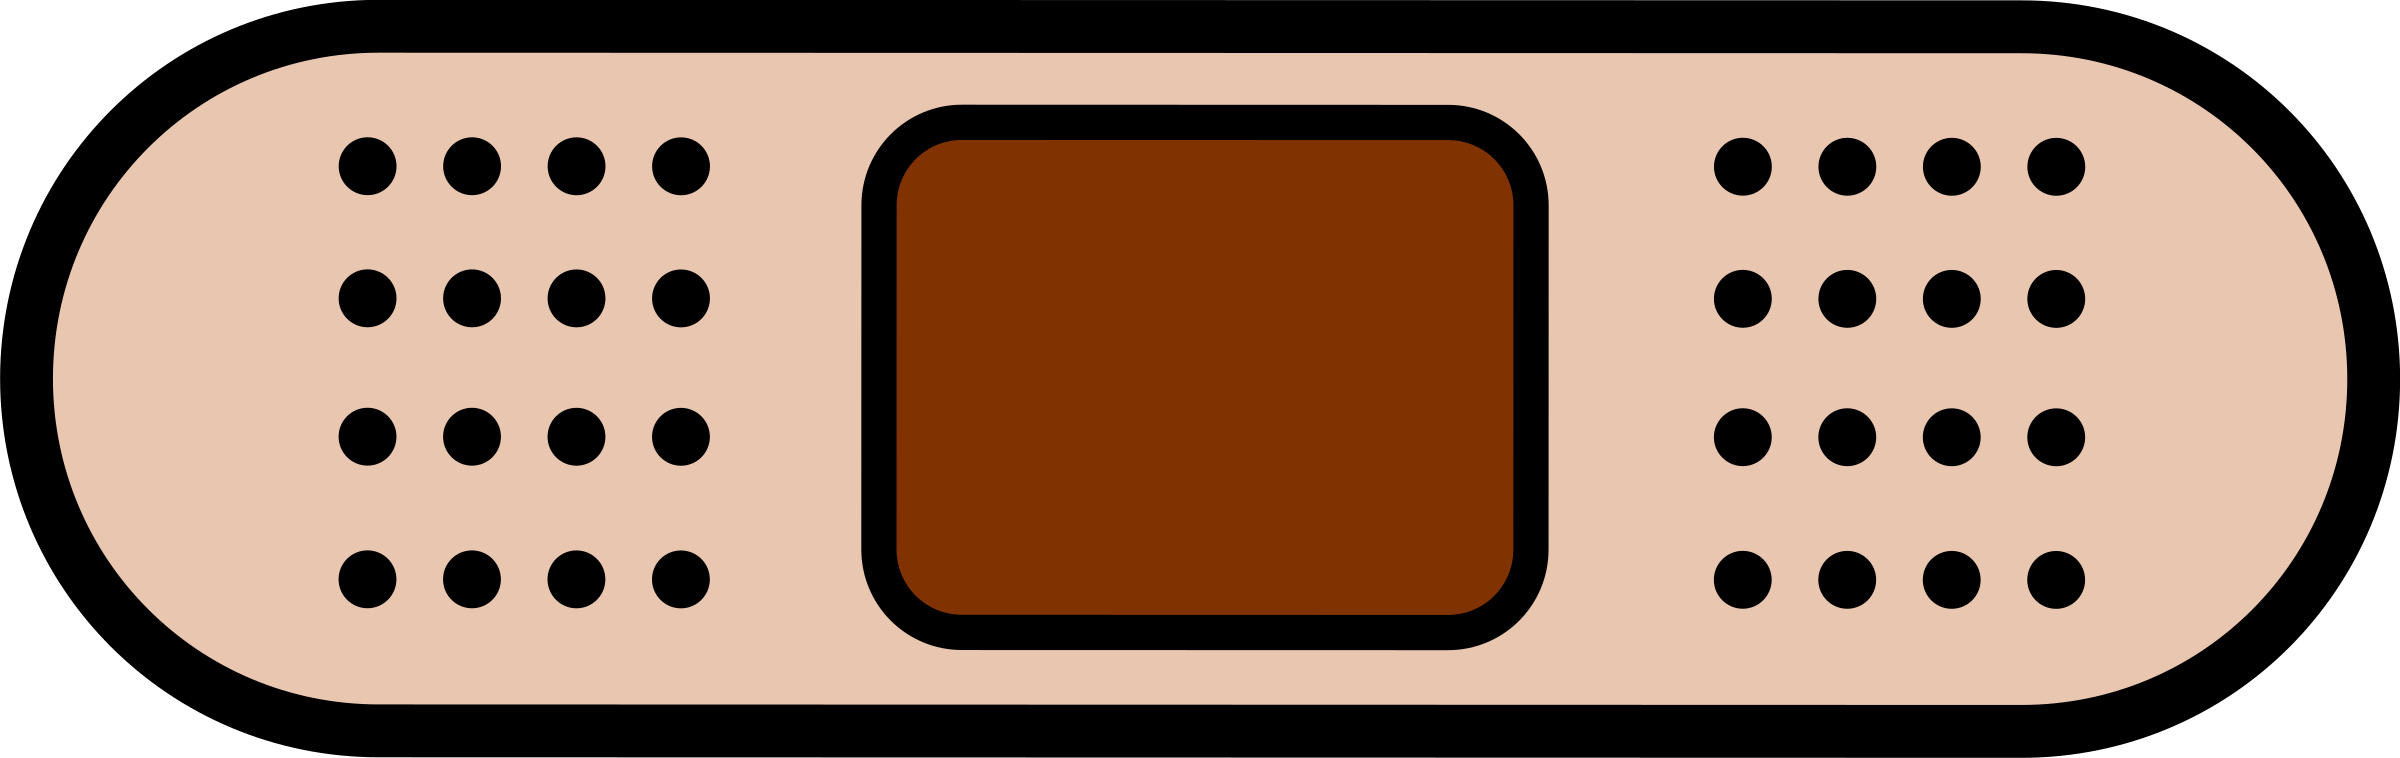 jpg bandage Icons PNG